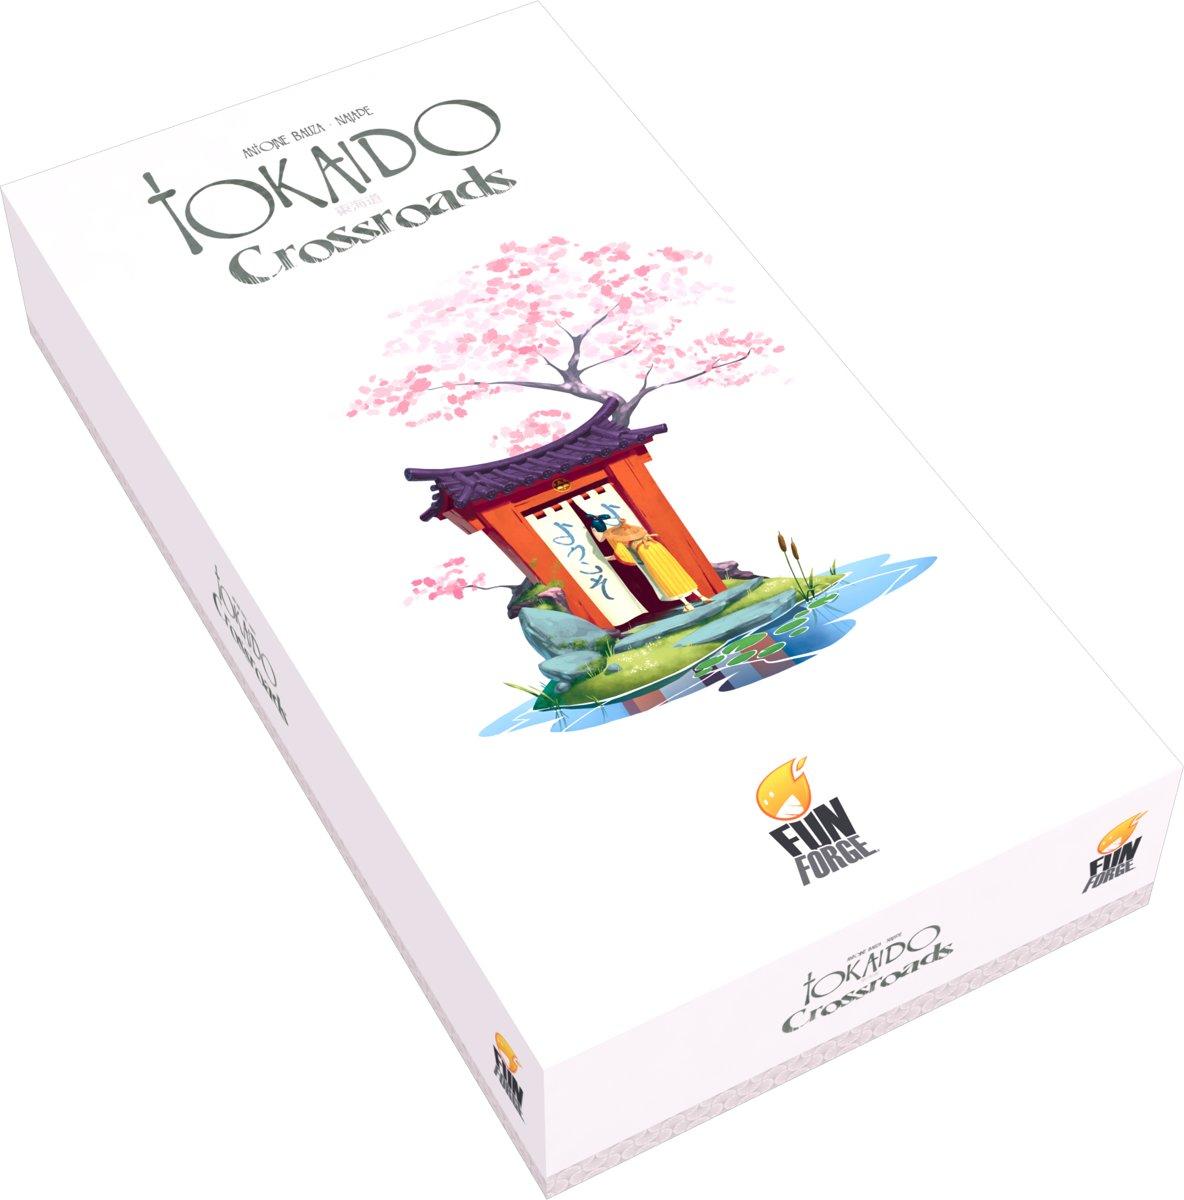 Tokaido Crossroads - Uitbreiding - Engelstalig bordspel